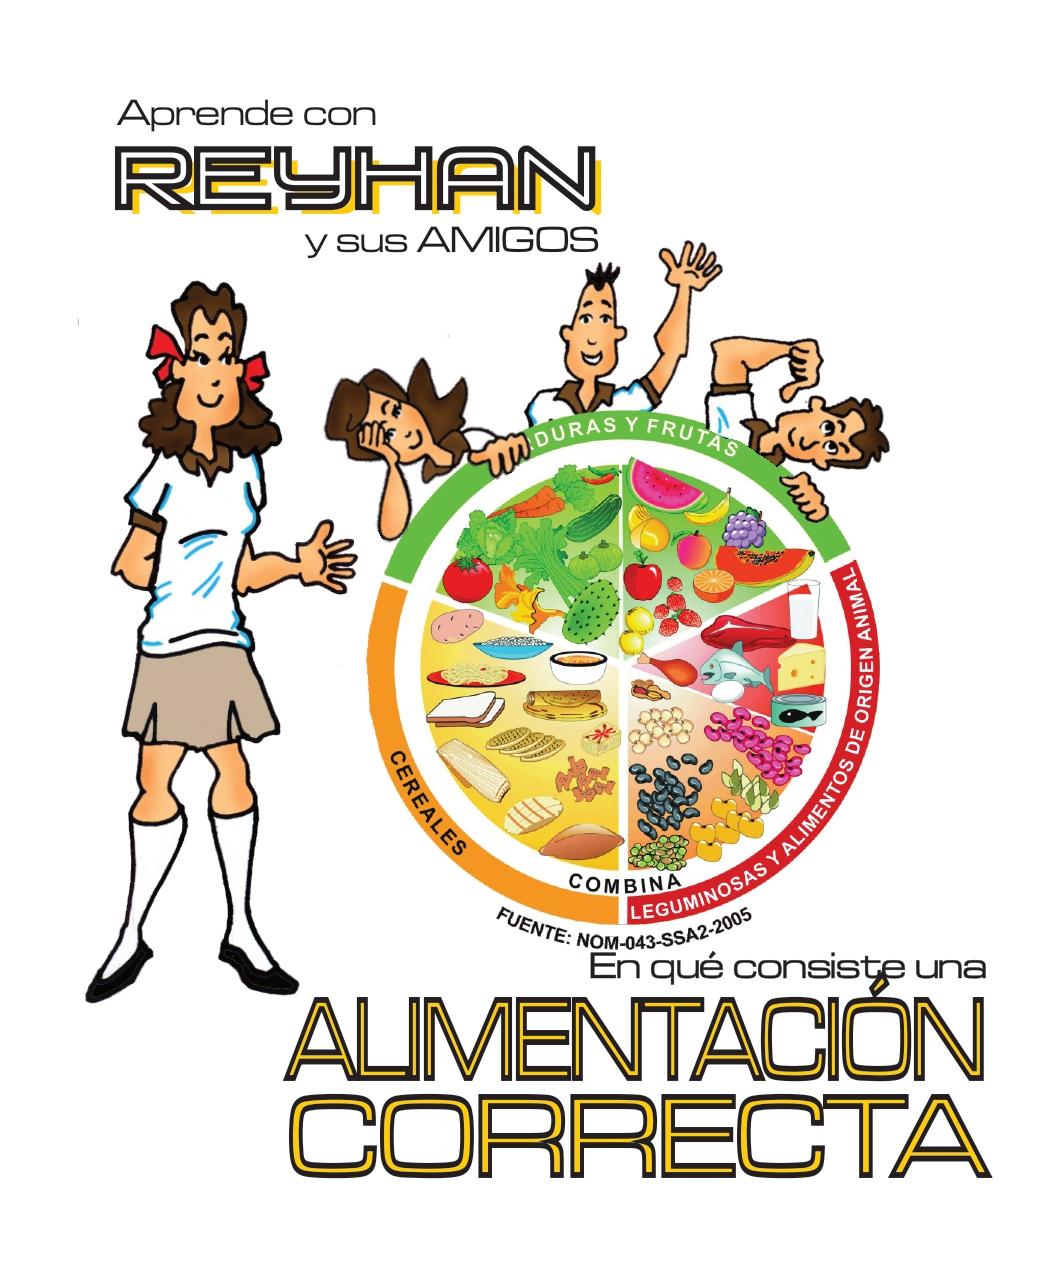 Alim recom Reyhan digital_page-0004